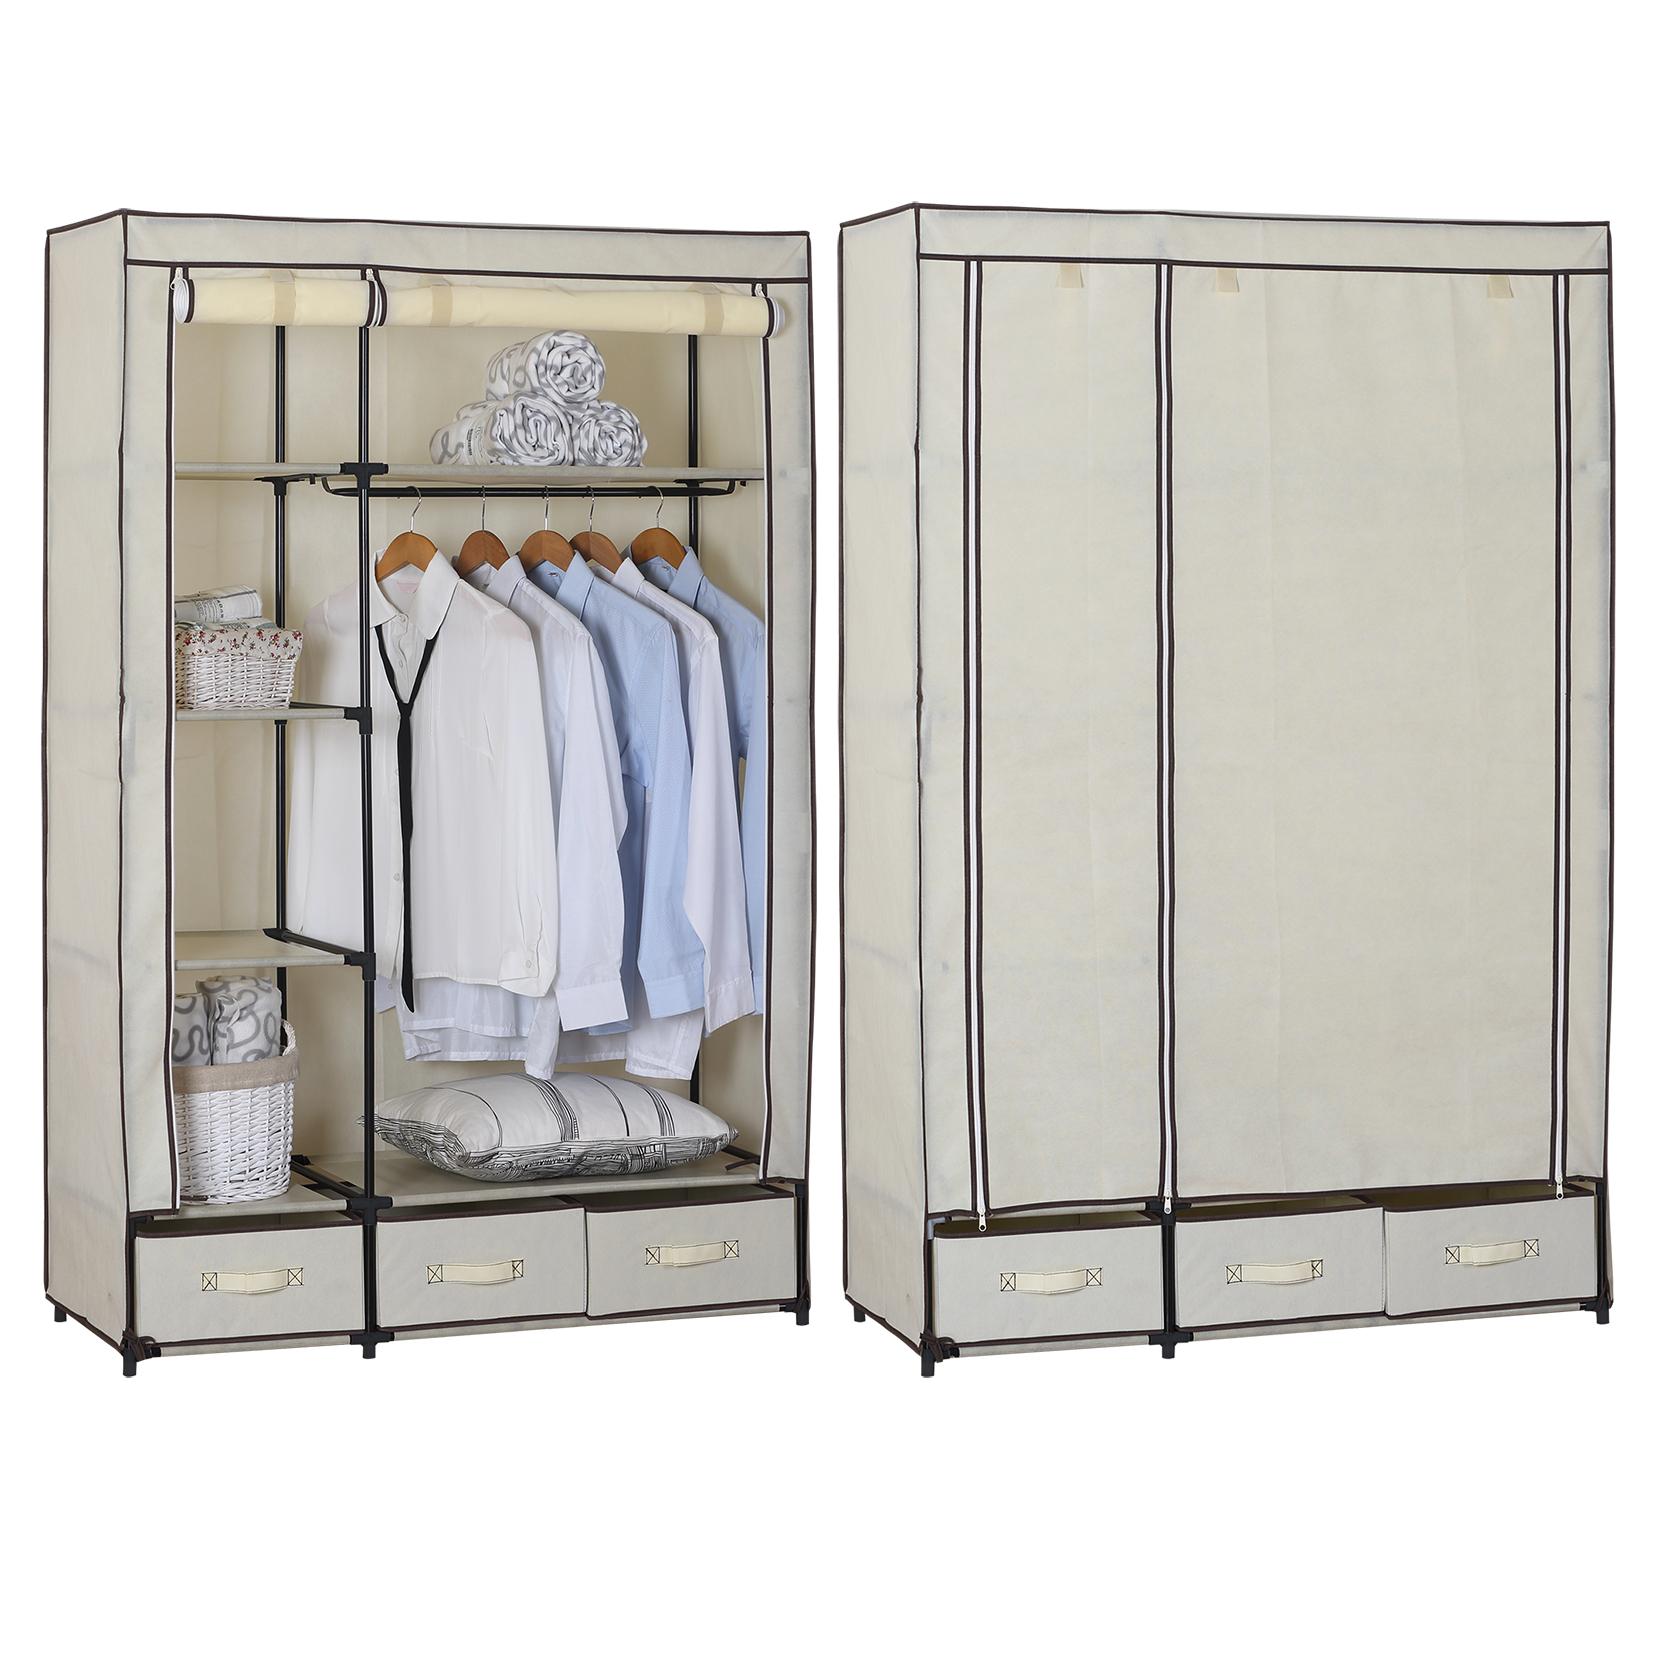 kleiderschrank garderobenschrank campingschrank faltschrank stoff creme ss5027cm ebay. Black Bedroom Furniture Sets. Home Design Ideas